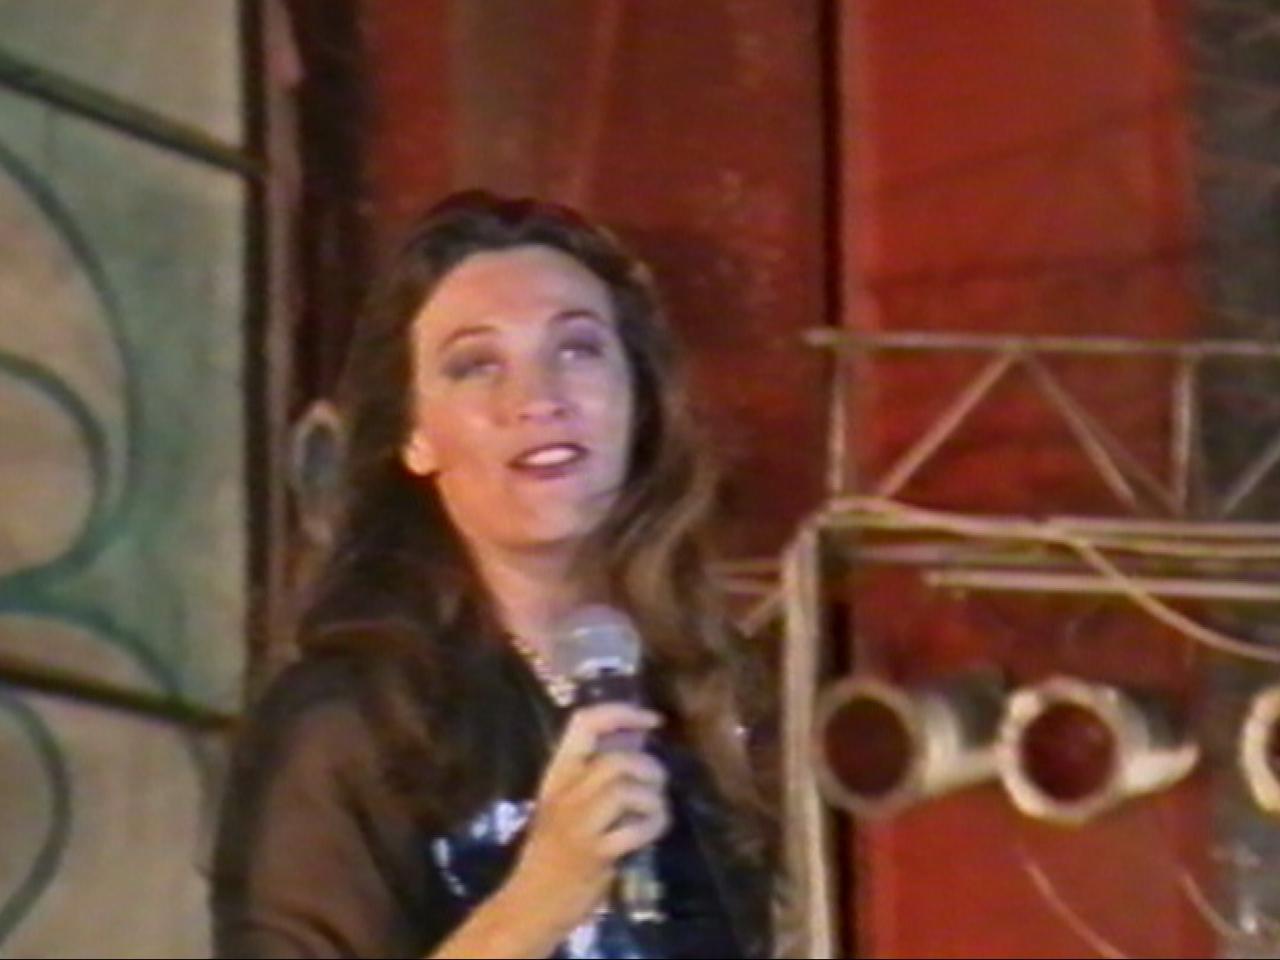 Amara 1997 - LauraStoica.jpg